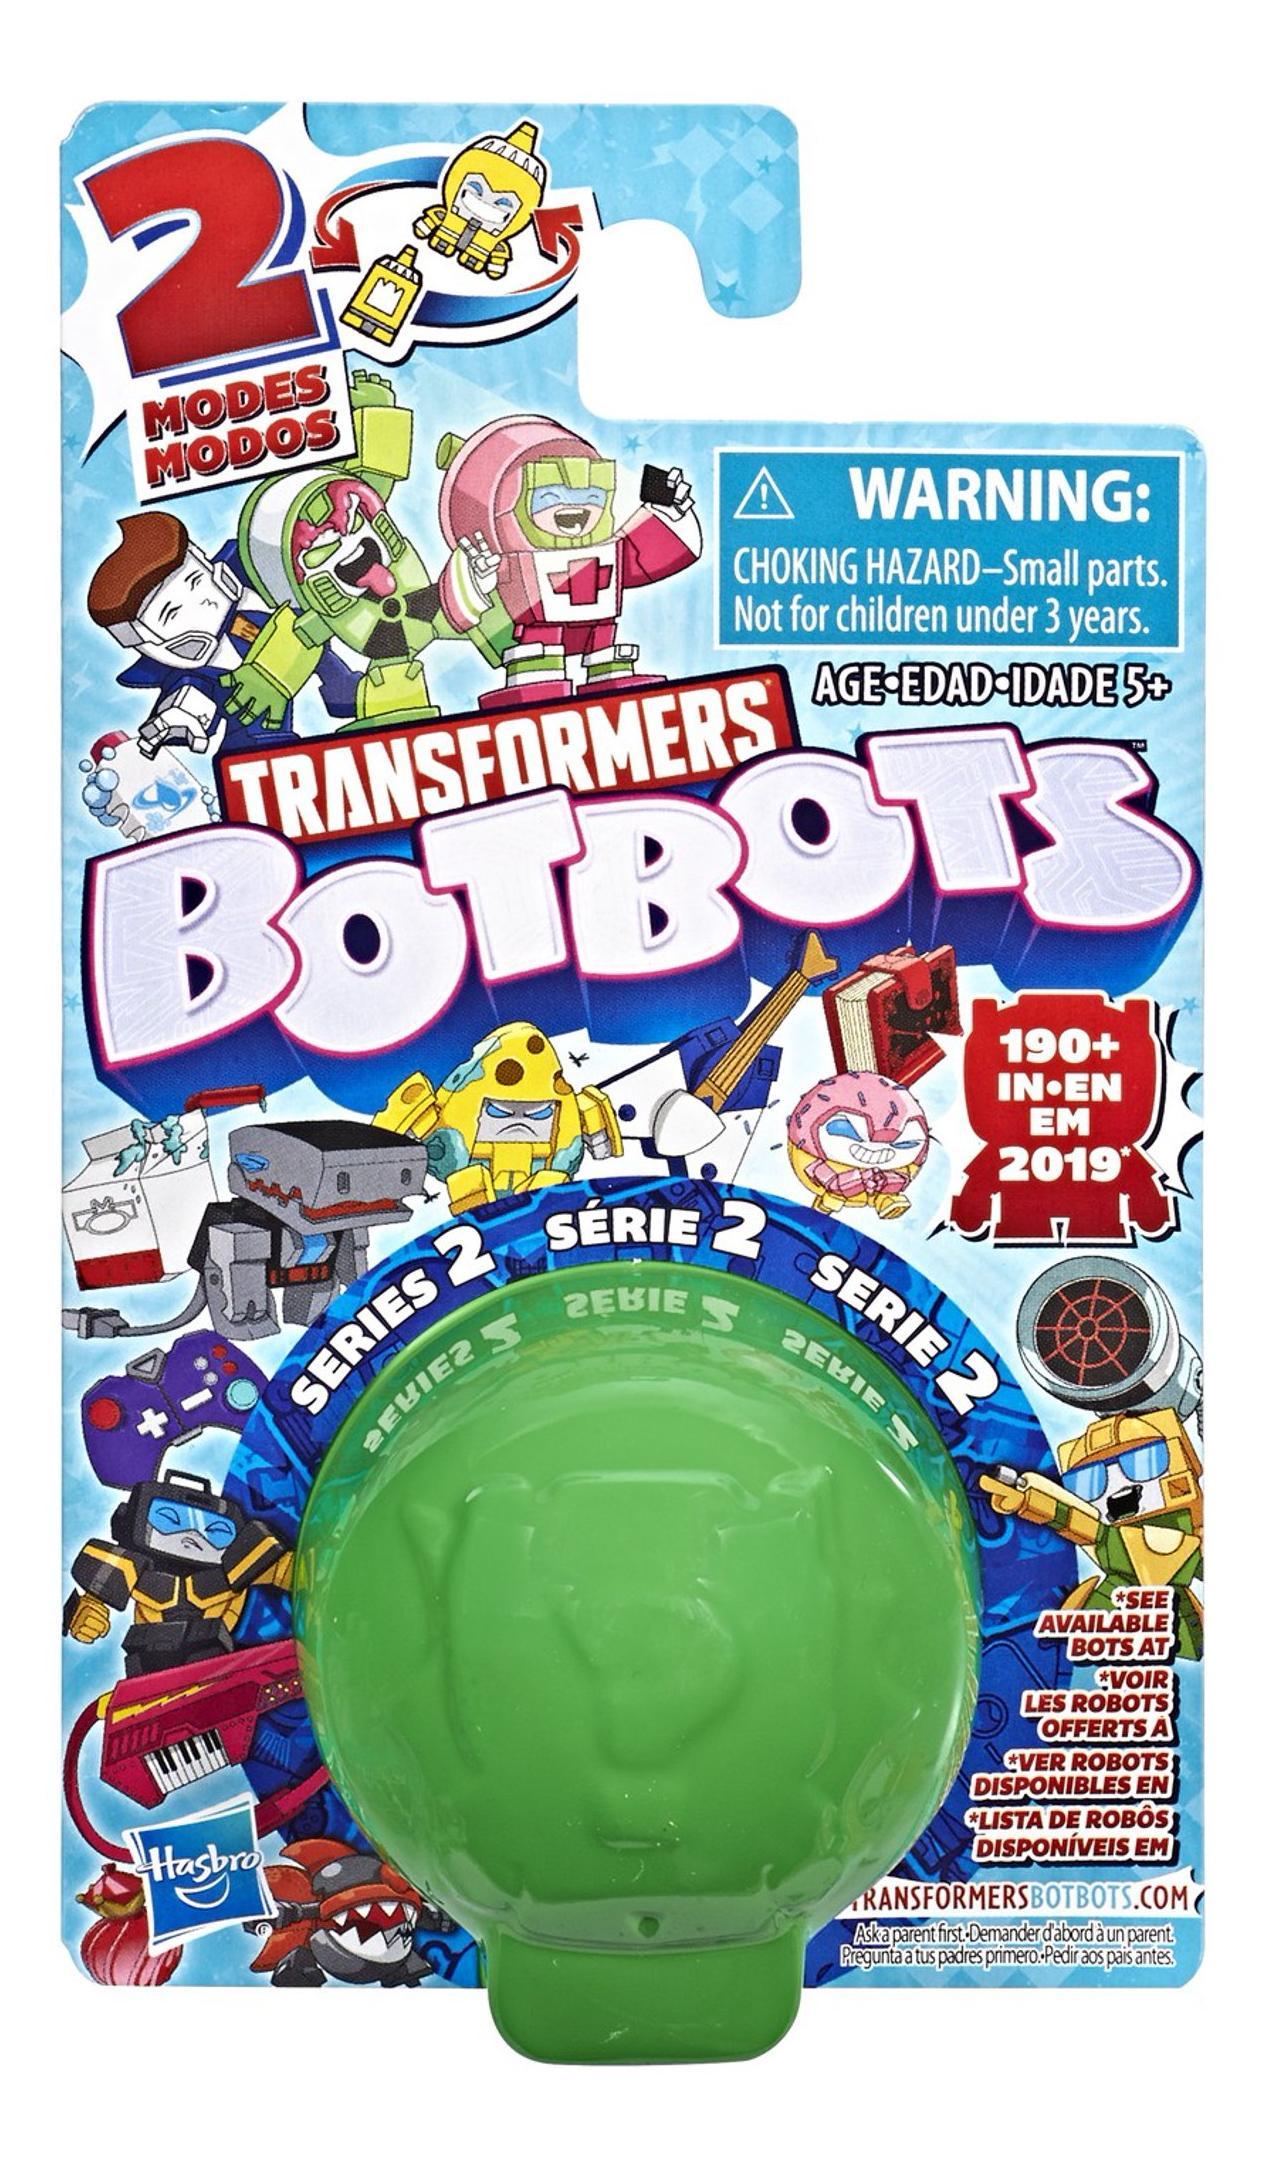 DUMBEATS Transformers BotBots Series 2 Music Mob 2019 drum kit set